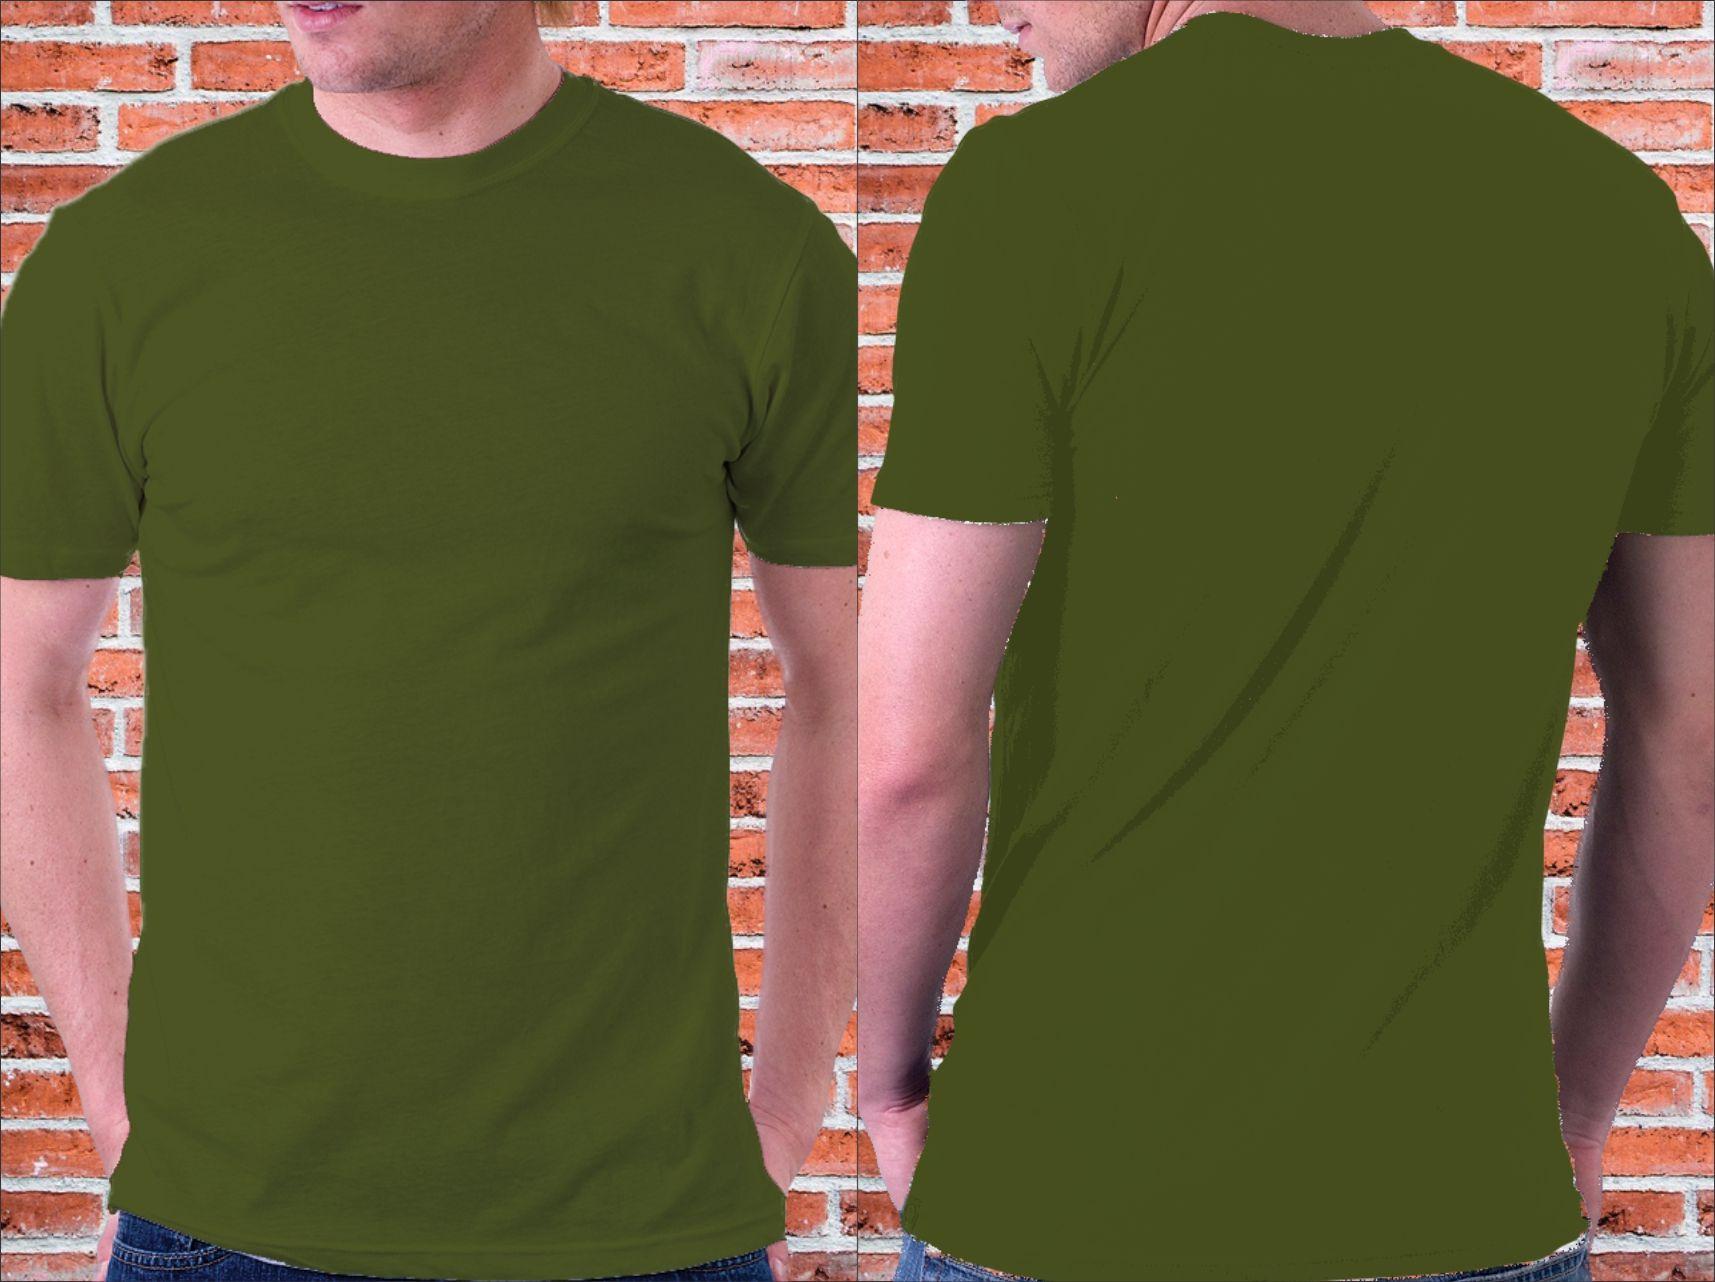 Download Mockup Kaos Polos Hijau Army Kaos Baju Kaos Vintage Outfits